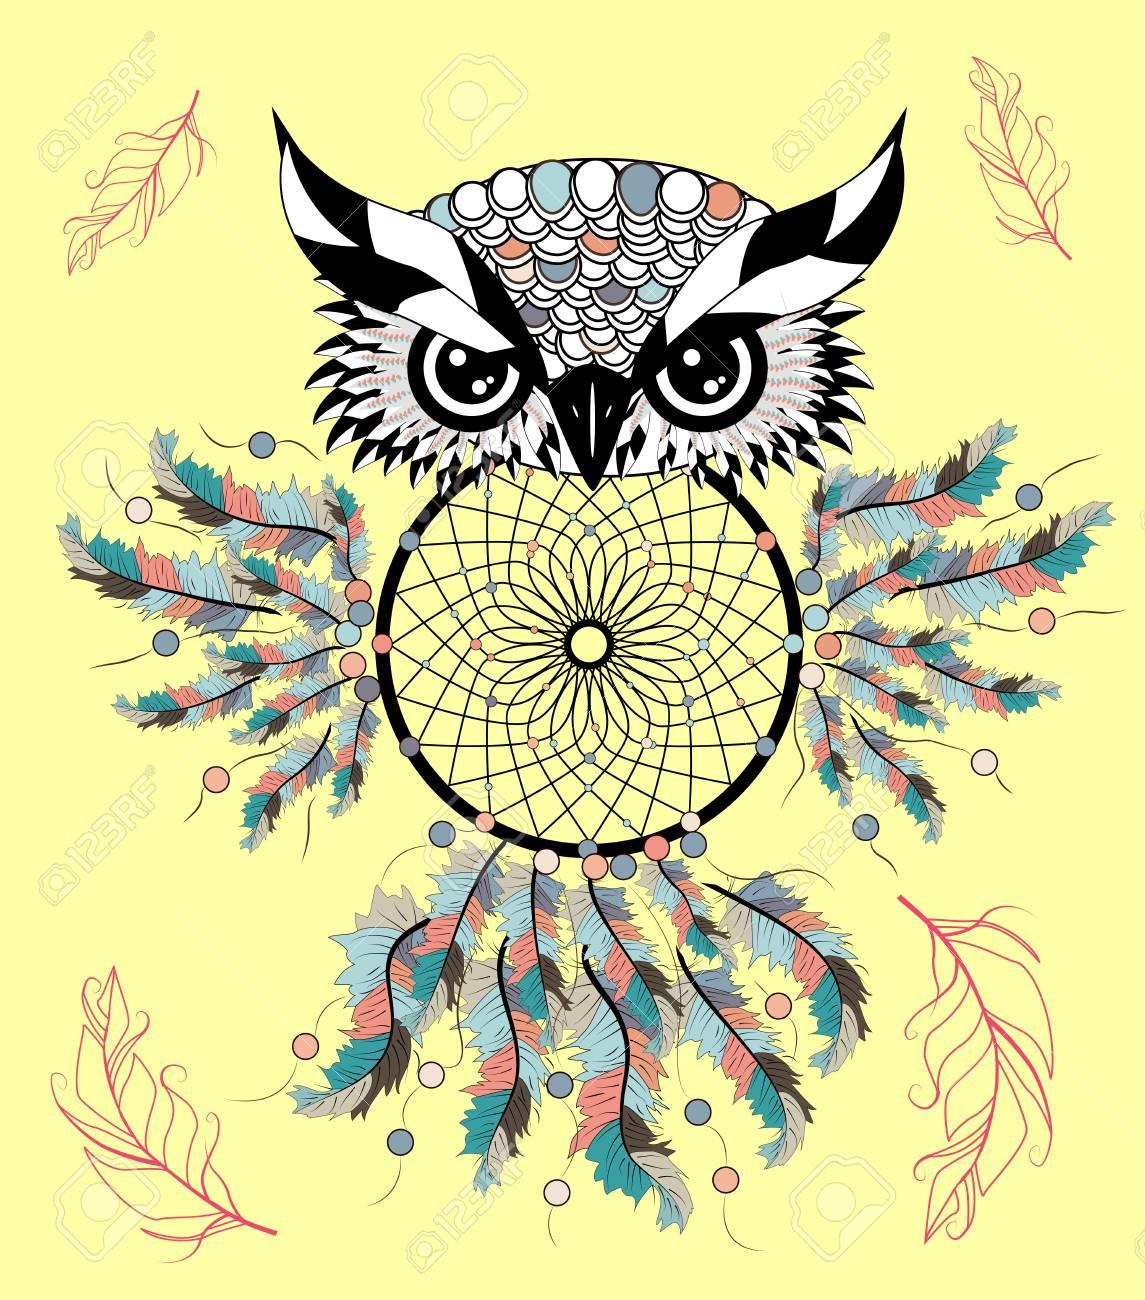 Dreamcatcher Owl Tattoo Art Mystic Symbol Abstract Feathers